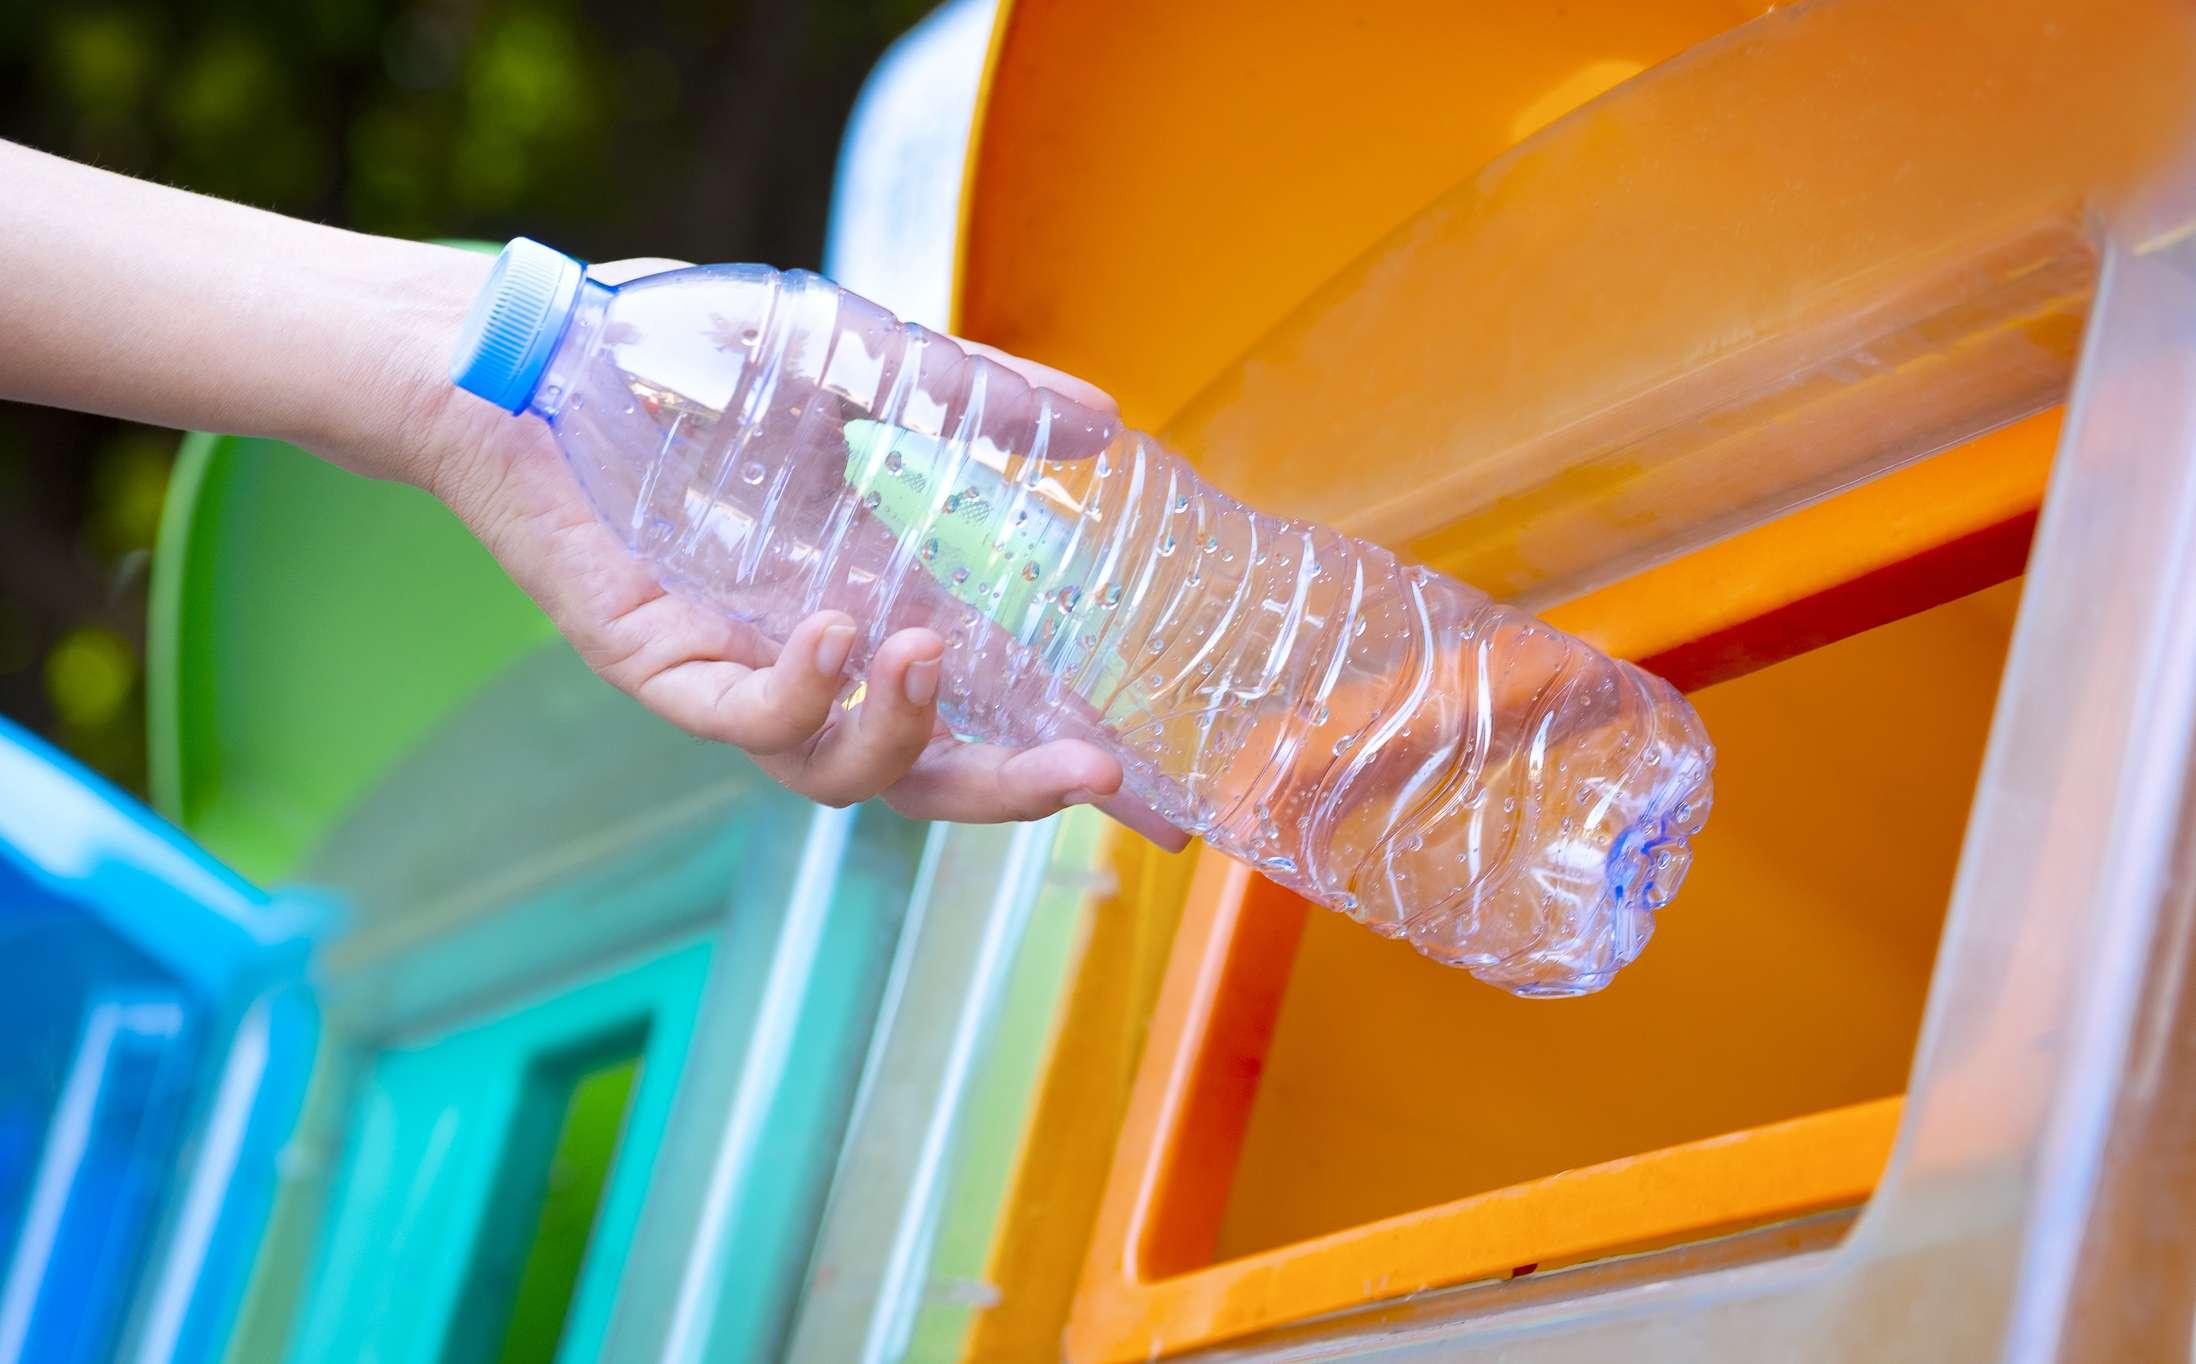 A hand puts a plastic bottle into a compost bin.